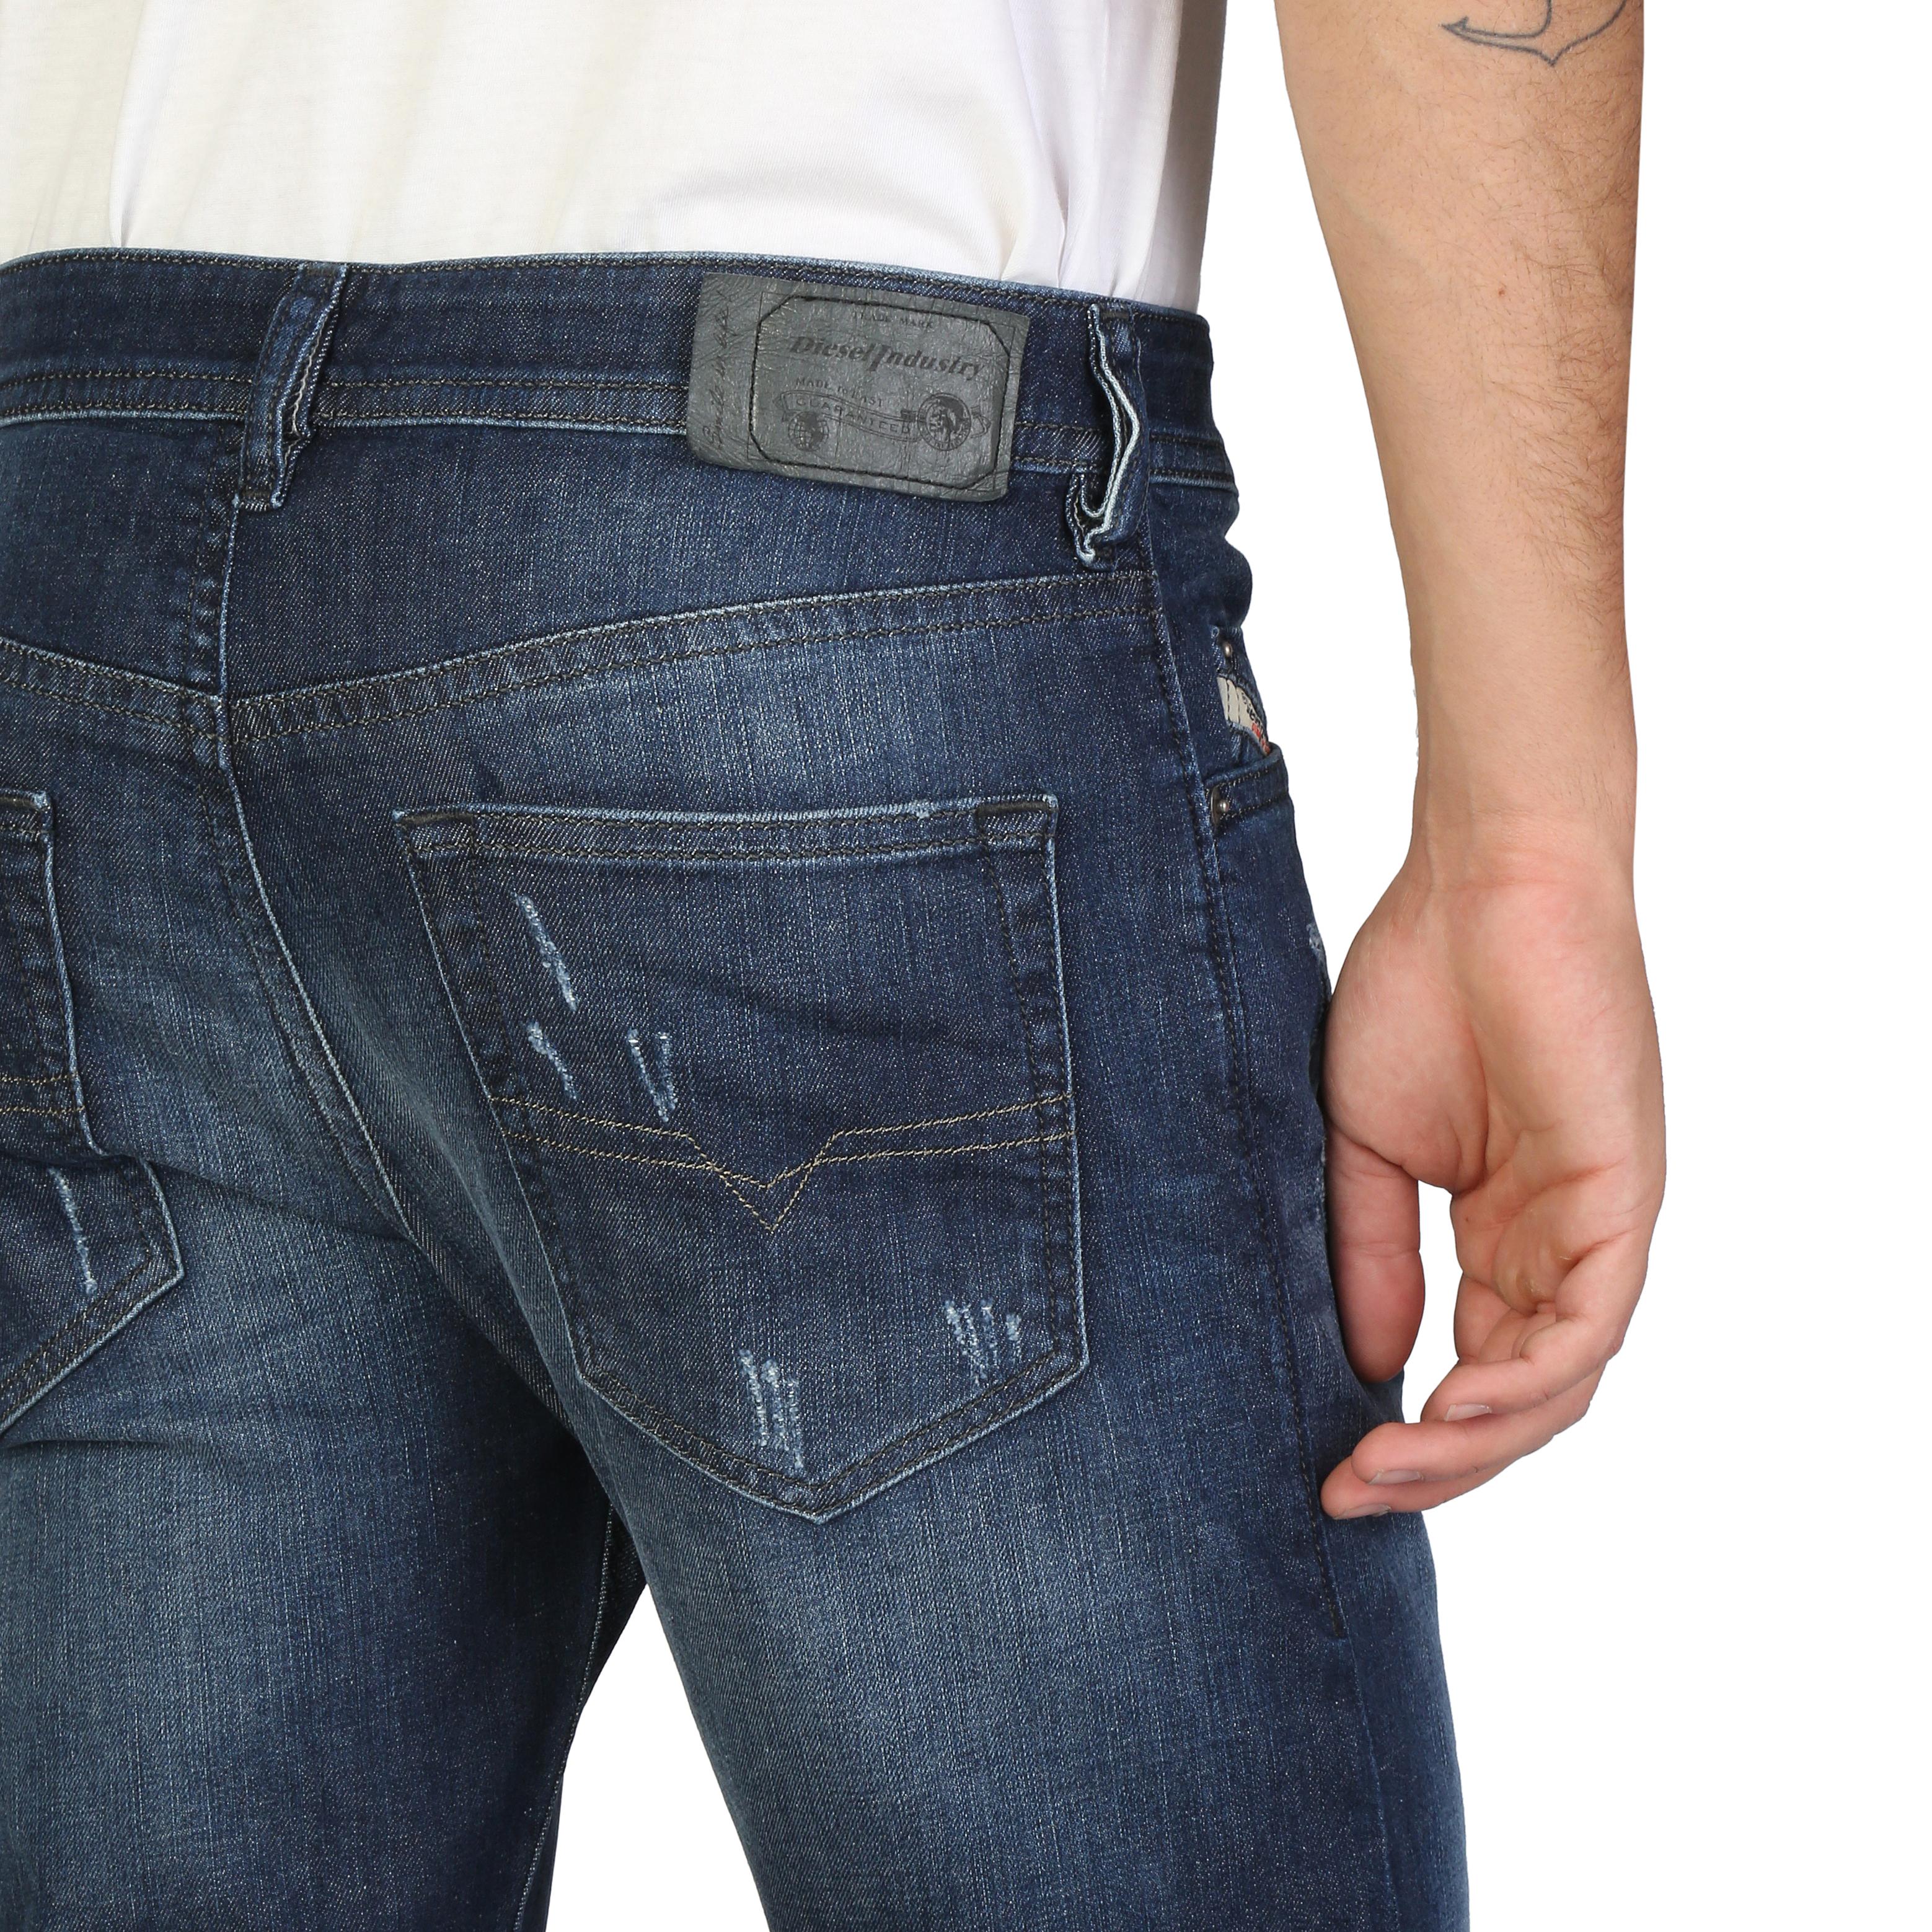 Jeans  Diesel BUSTER_L32_00SDHB blue